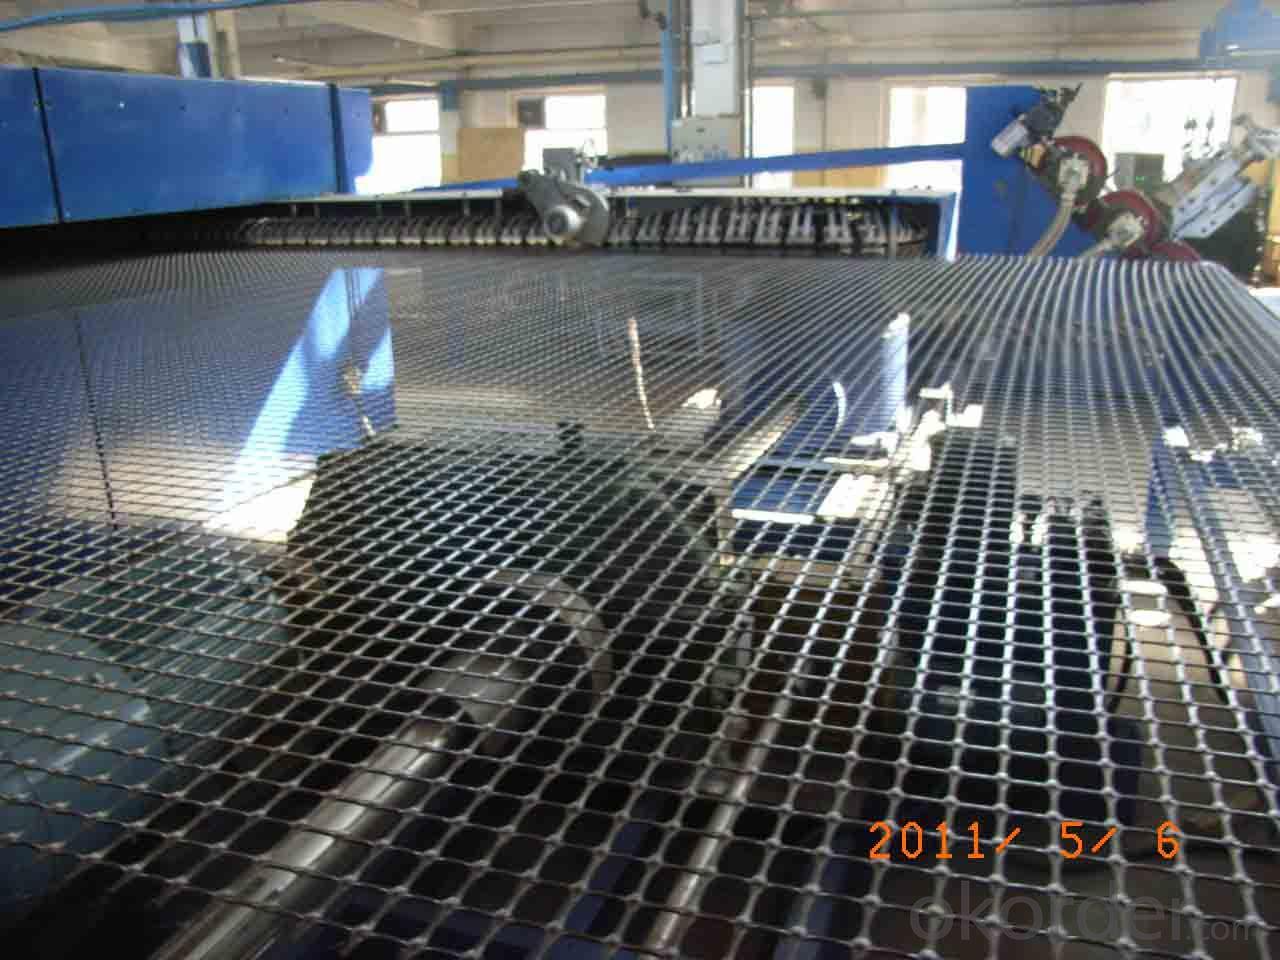 Asphalt Pavement Fiberglass Geogrid Made for Road Consolidation